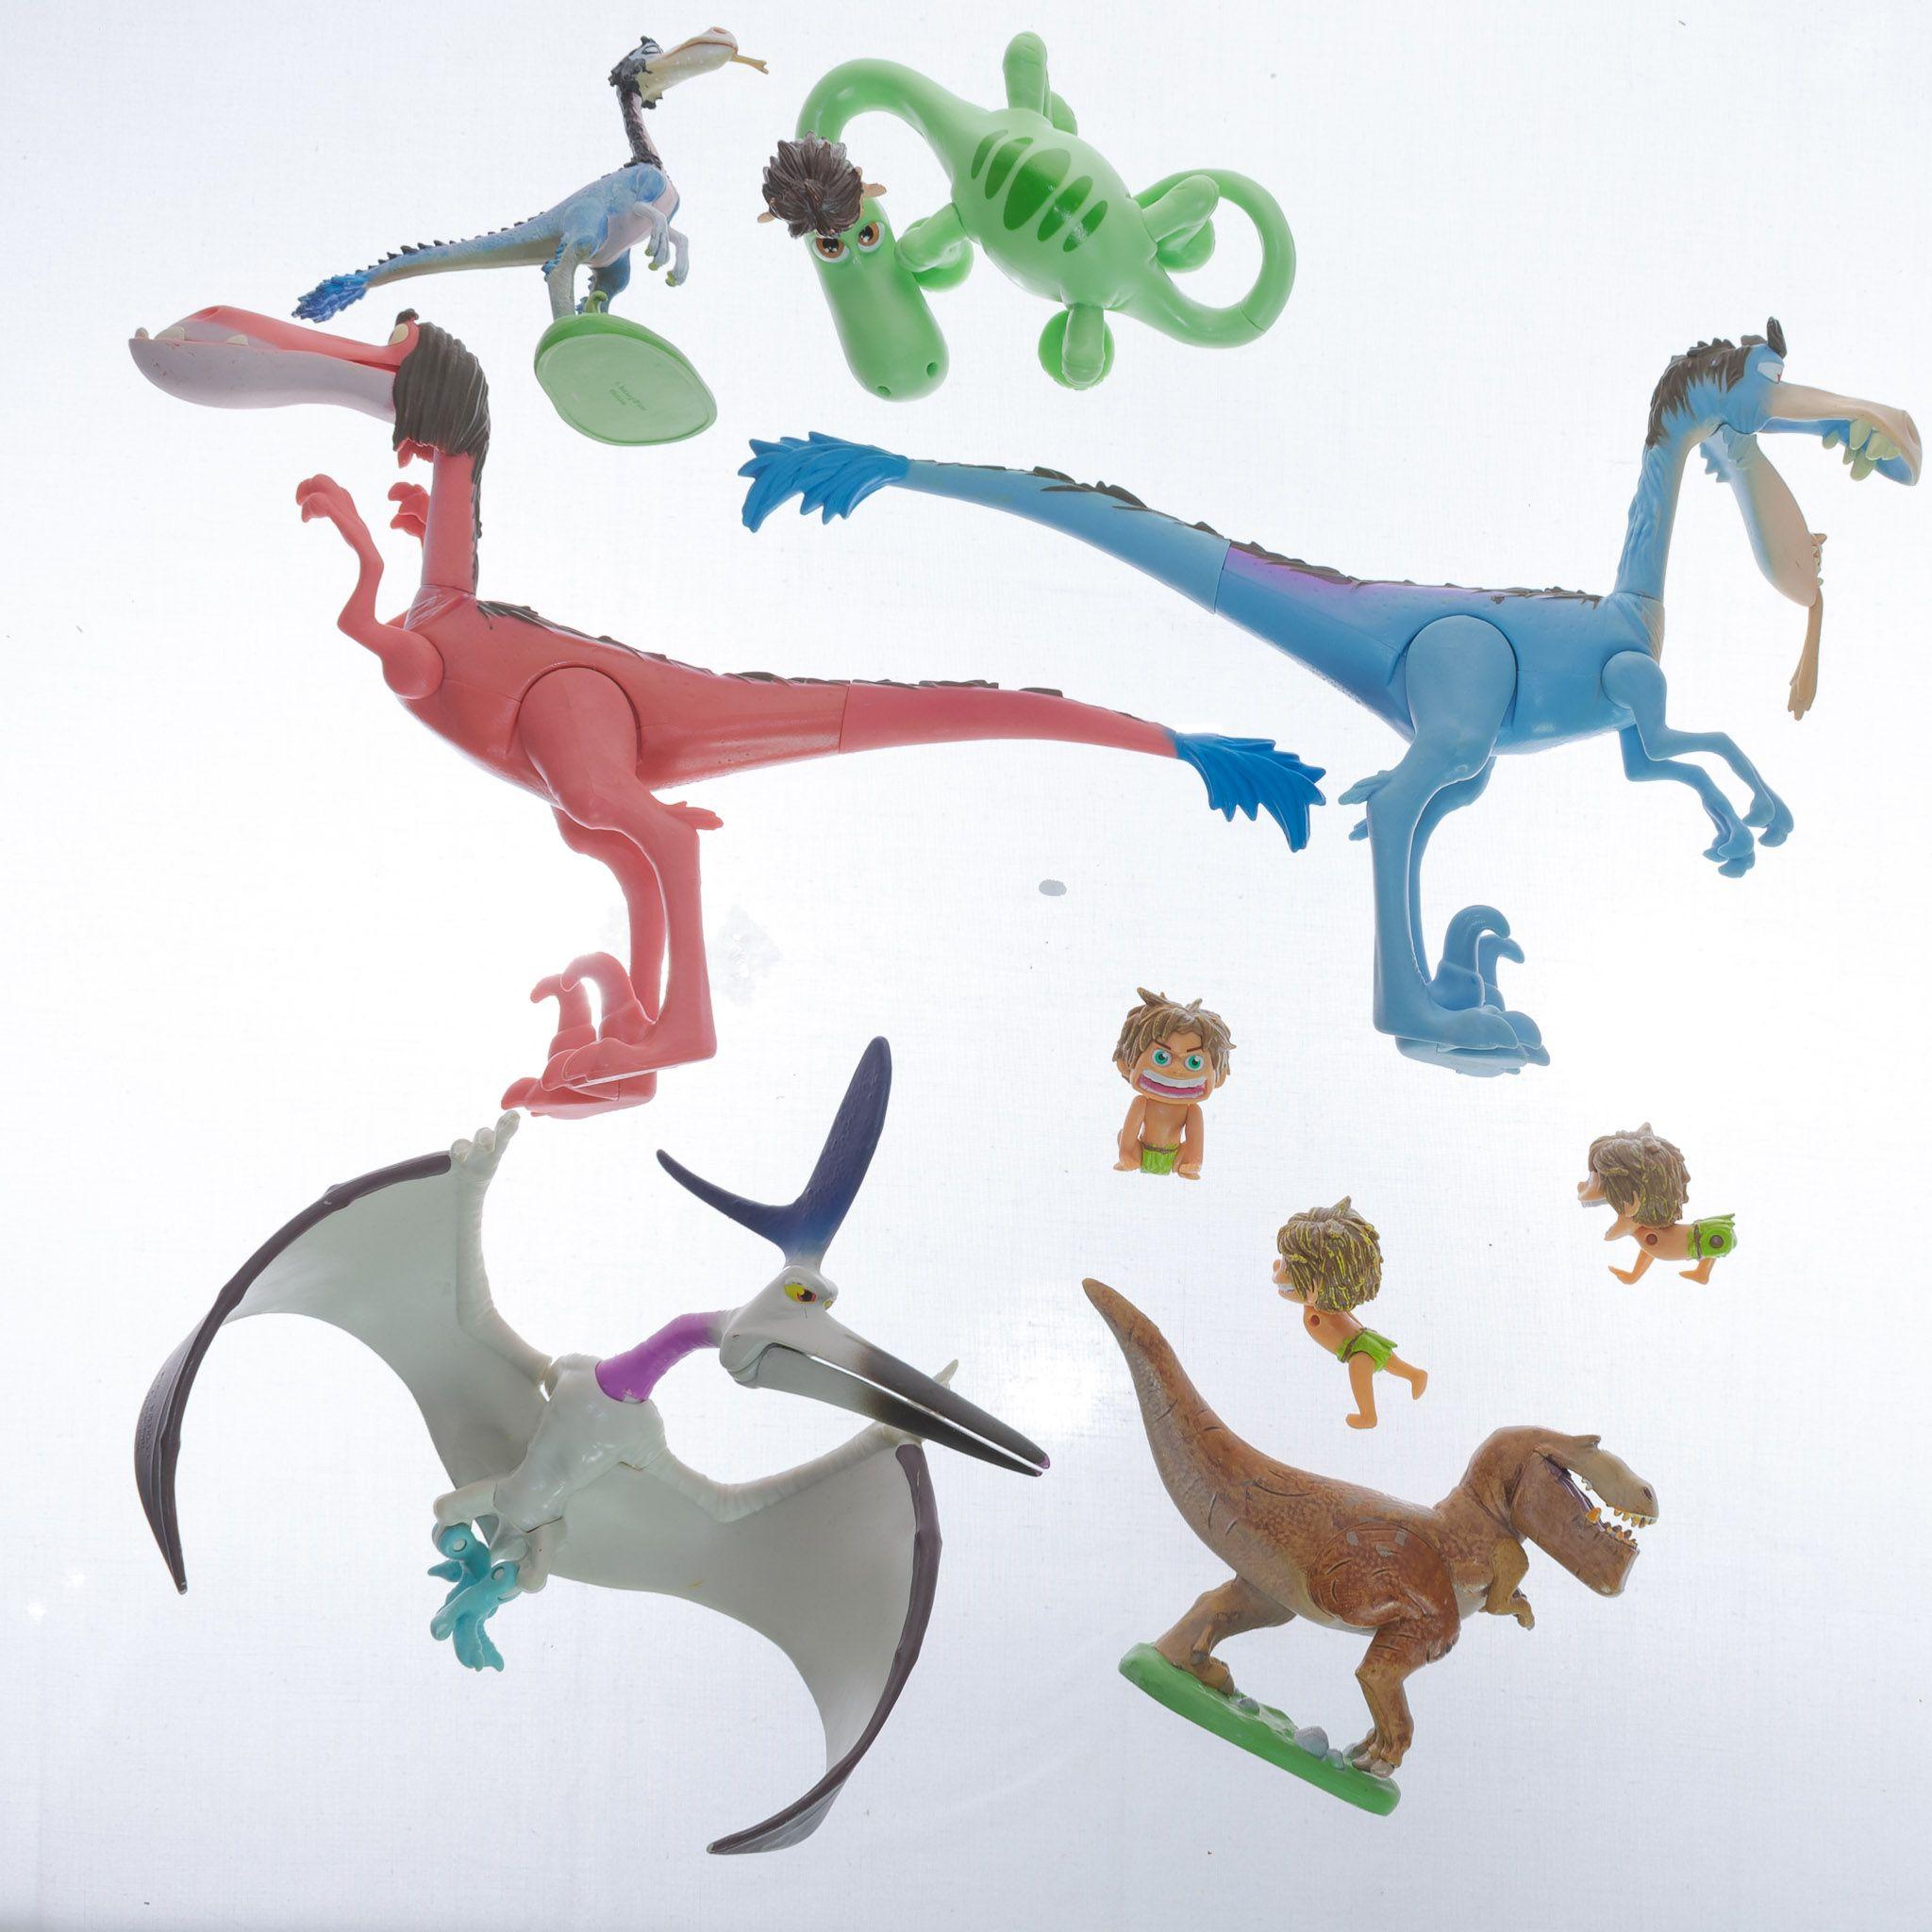 4 disney pixar good dinosaurs mixed lot thunderclap buddha